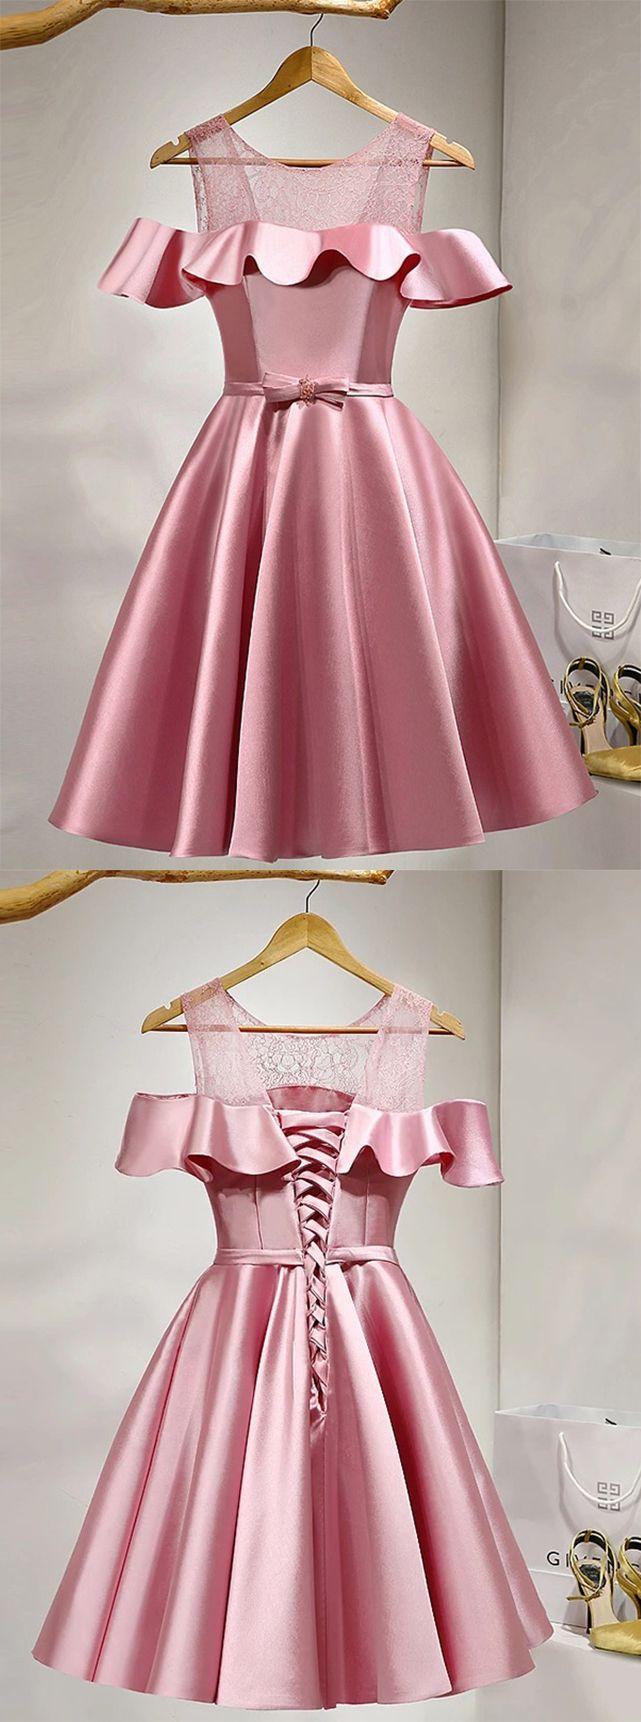 Pink homecoming dressesshort prom dressesgirls cocktail dress